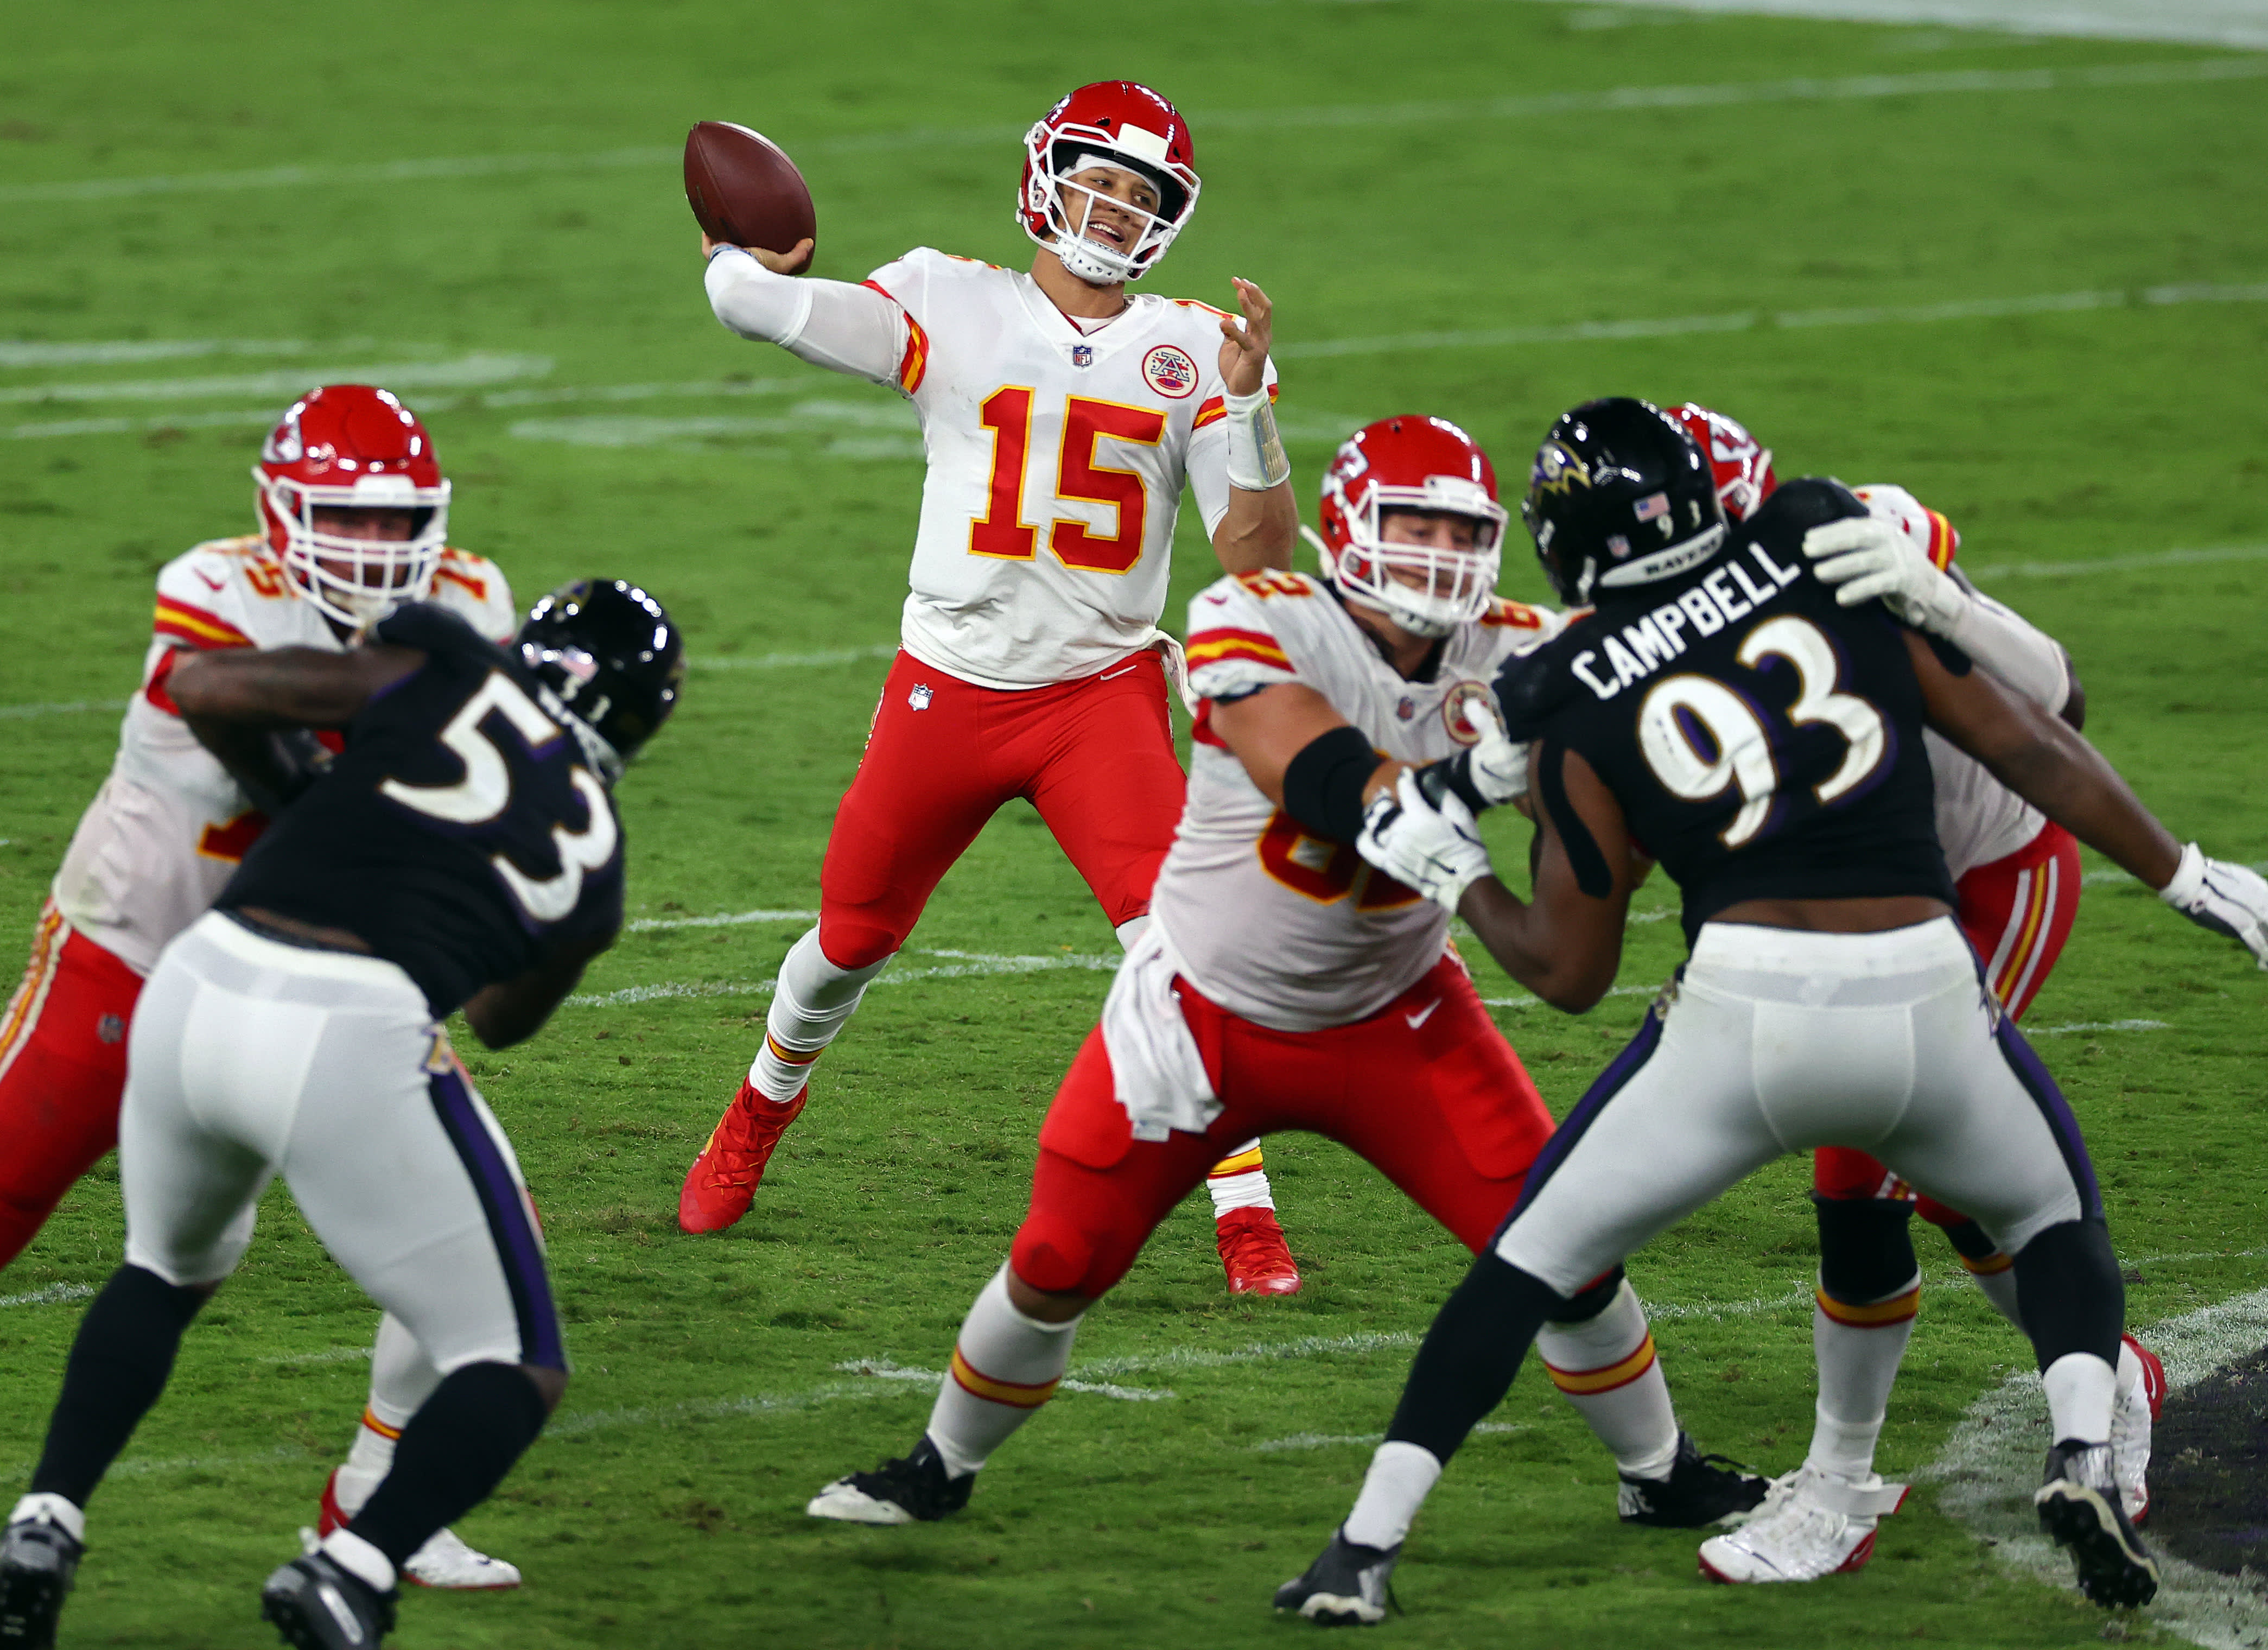 Chiefs Ravens Espn Monday Night Matchup Averages 14 Million Viewers